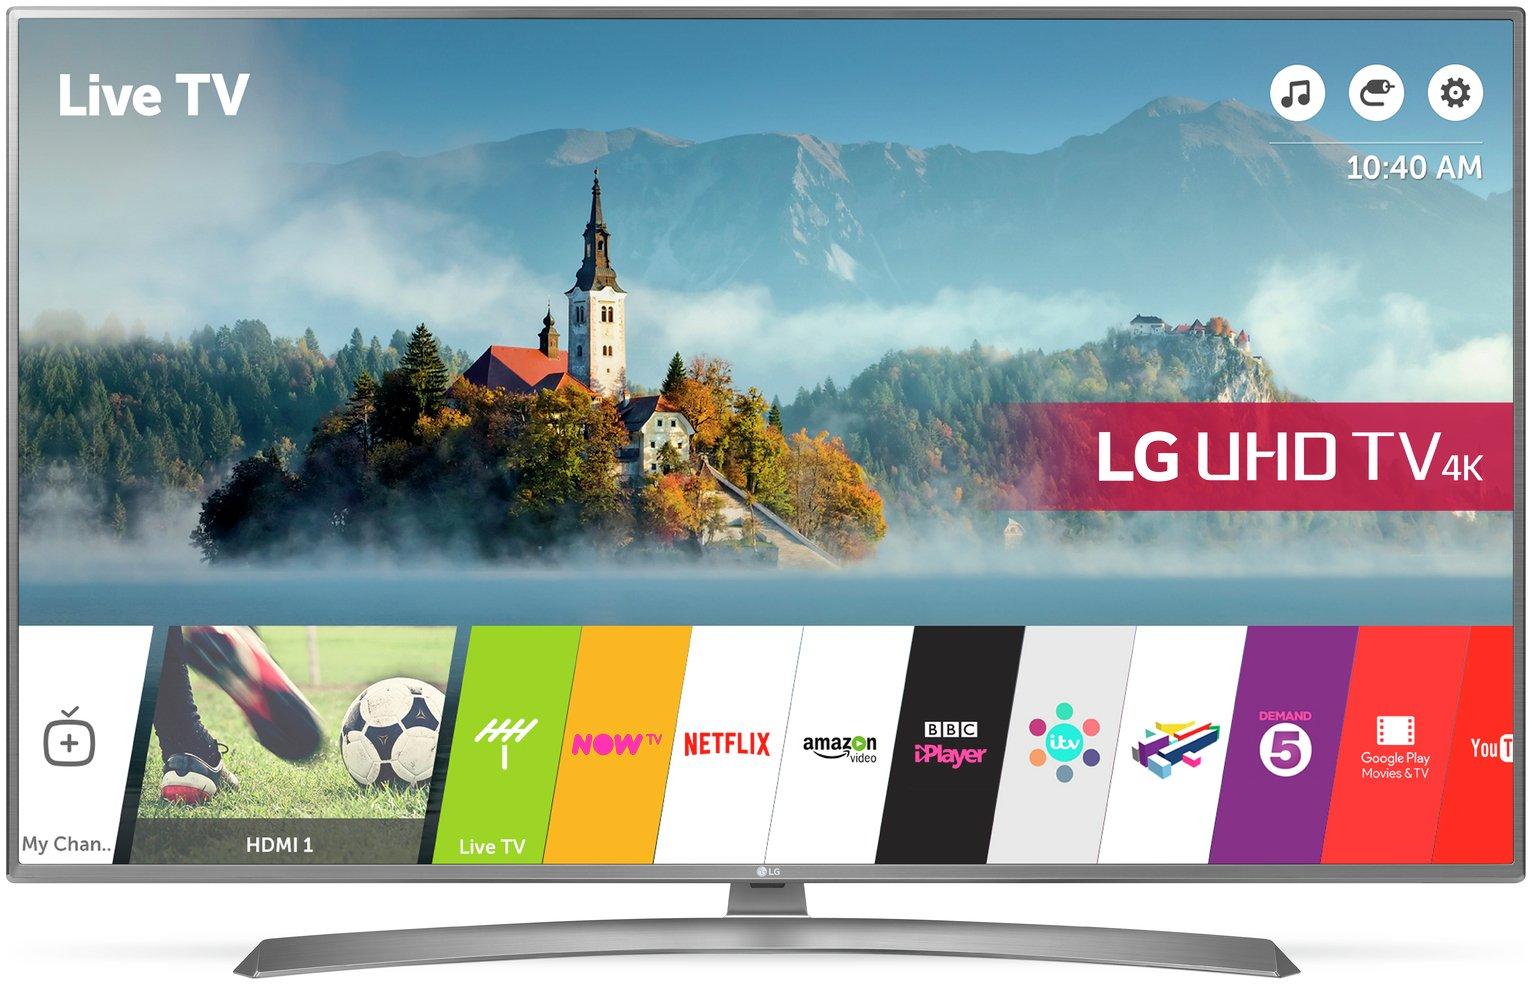 LG LG 65UJ670V 65 Inch Smart 4K Ultra HD TV with HDR